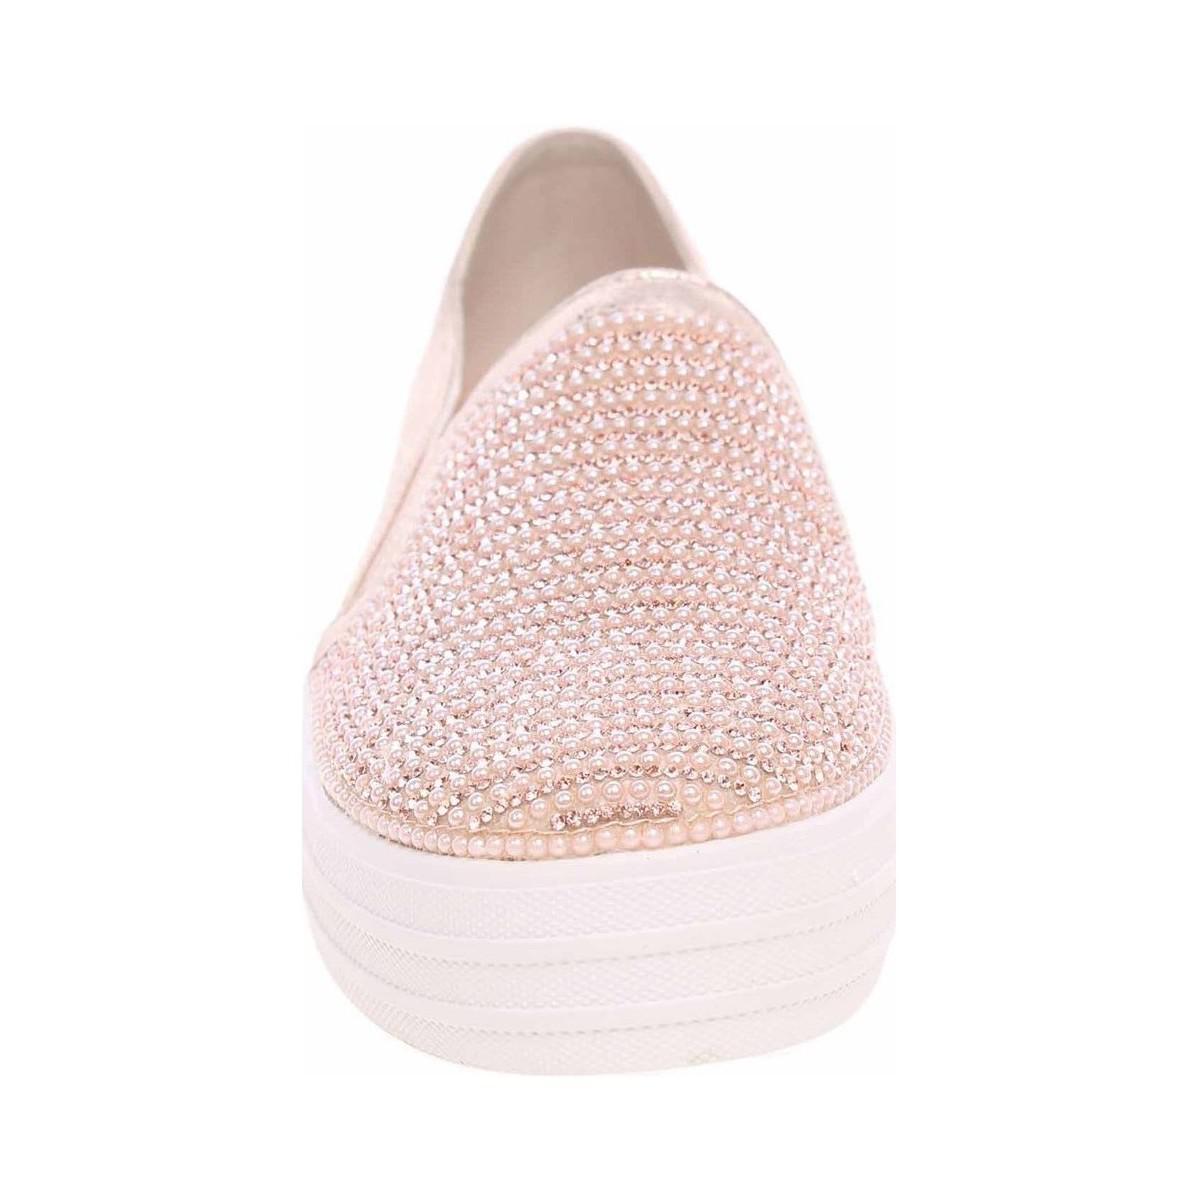 d331a5797d6 Skechers Double Up Shiny Dancer Rose Gold 801 Rsgd Men s Shoes In ...